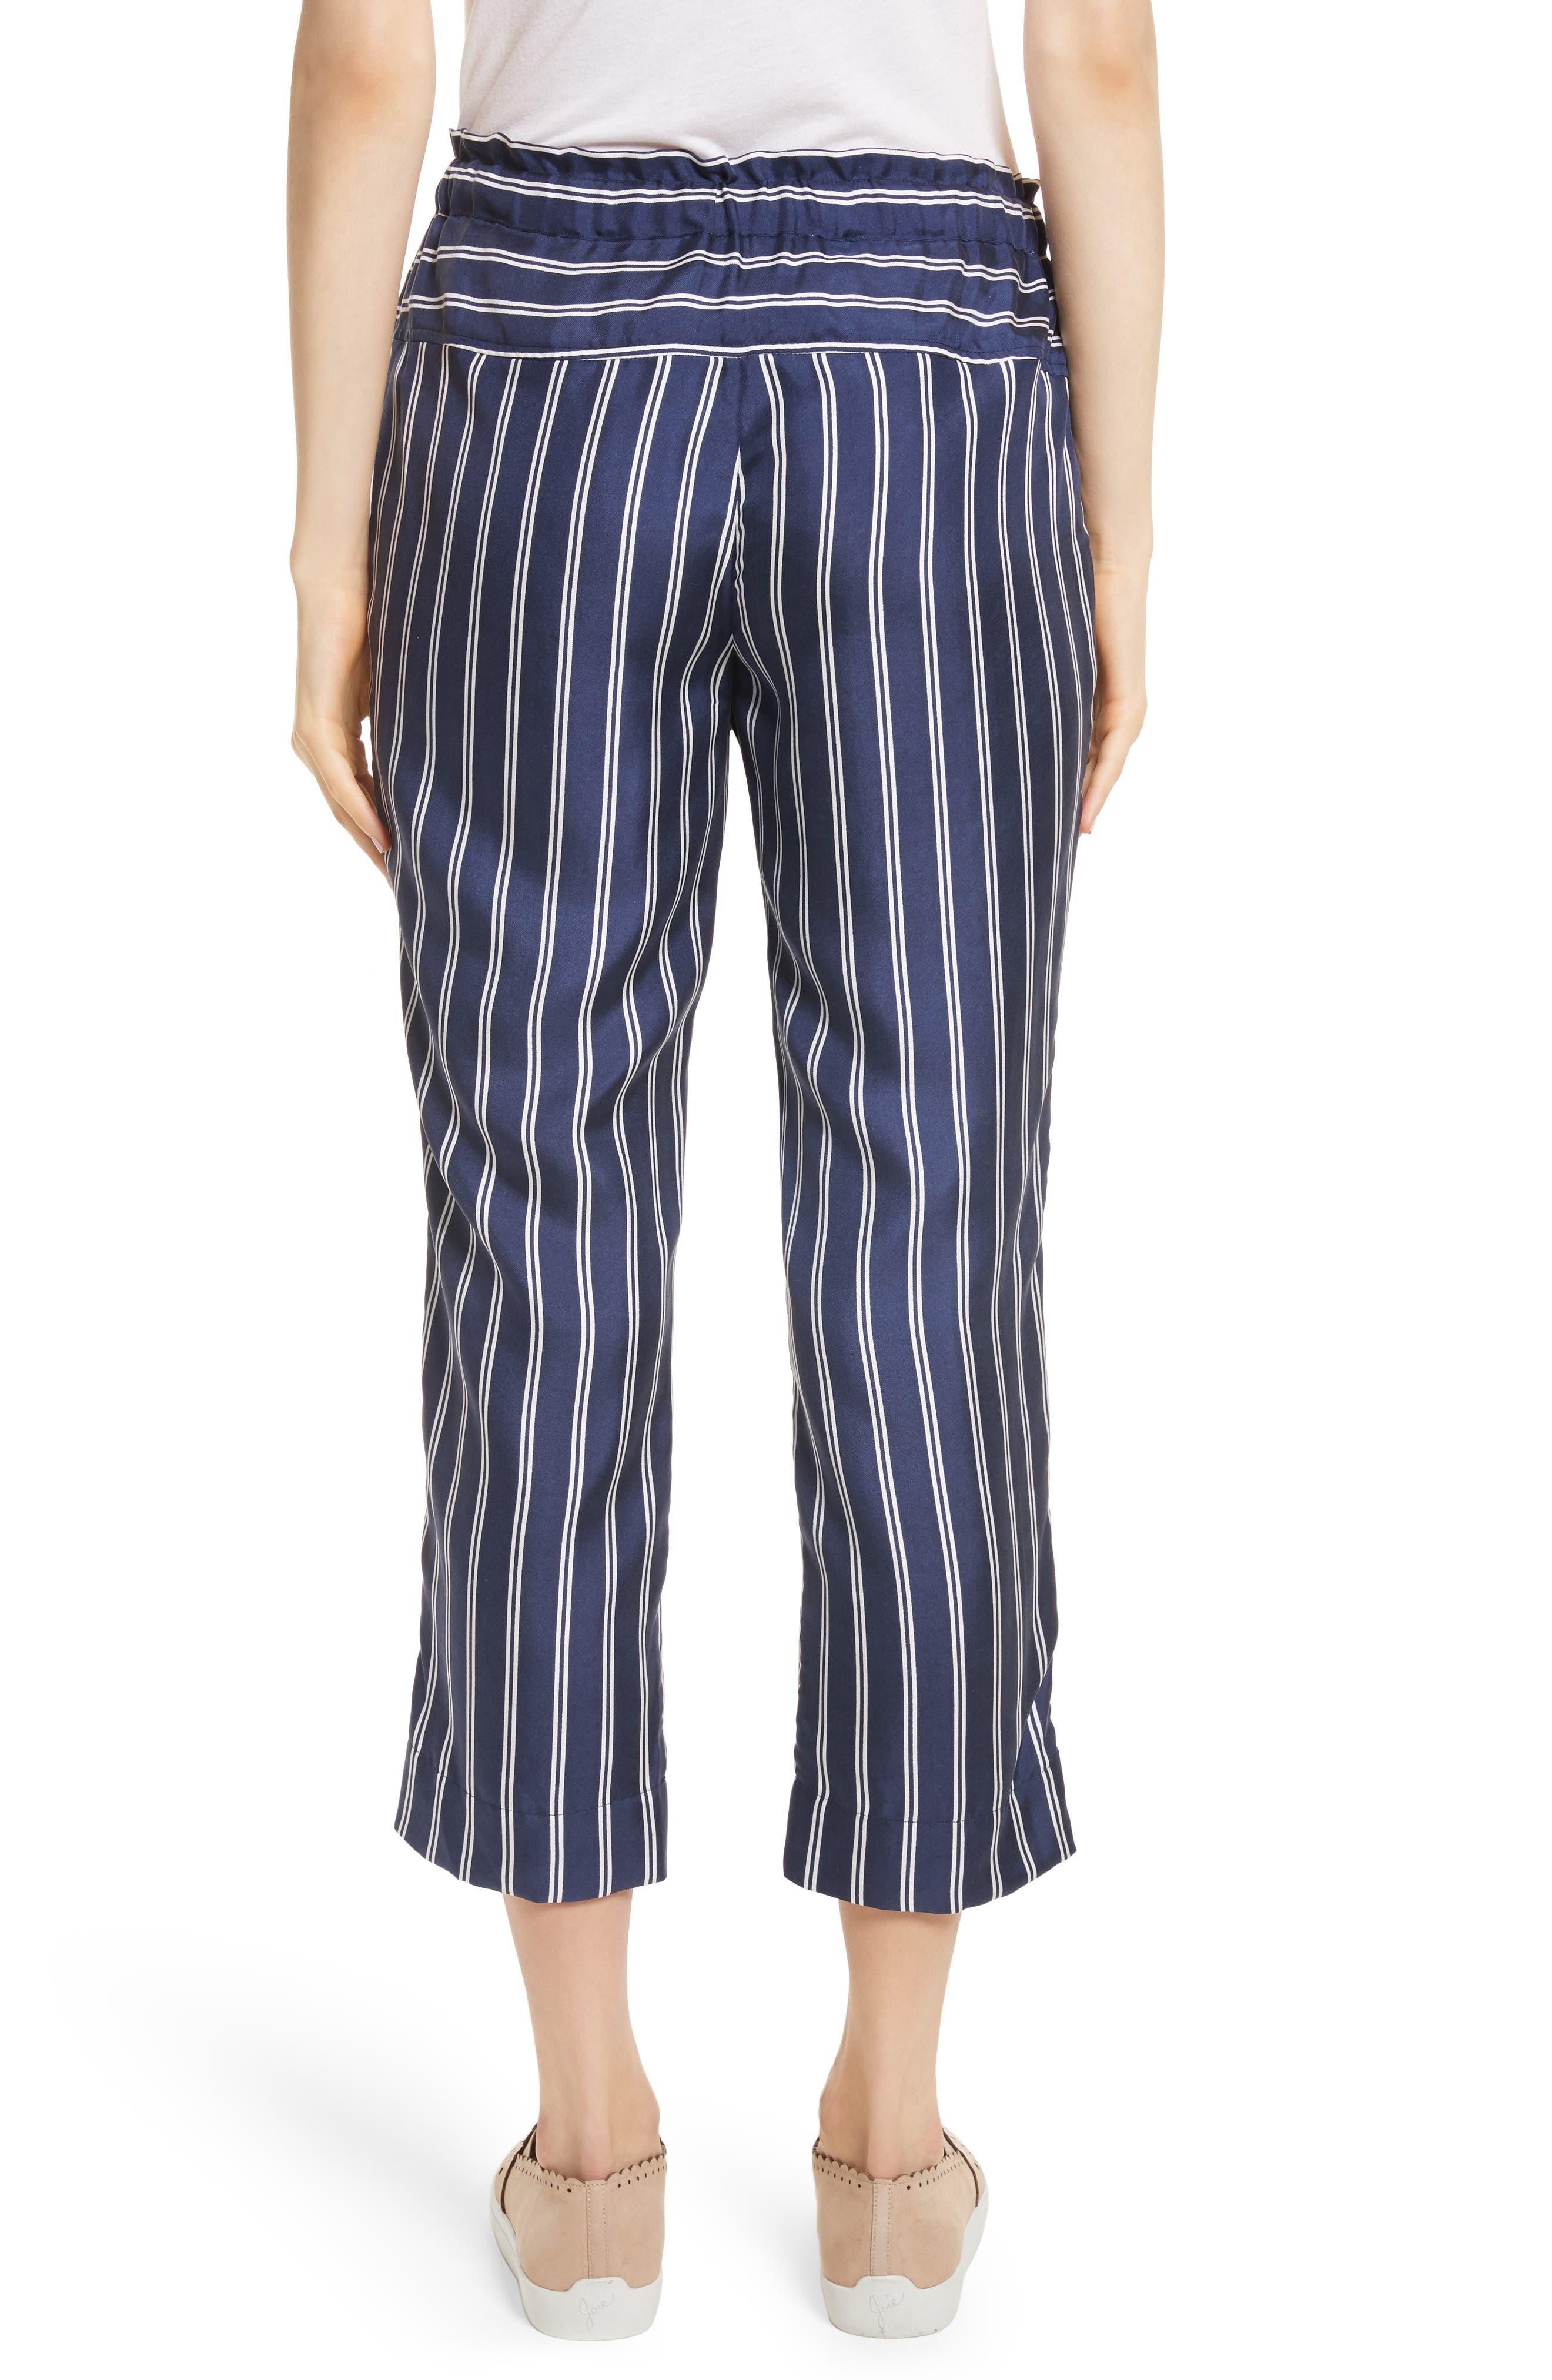 Addiena Stripe Silk Pants,                             Alternate thumbnail 2, color,                             418